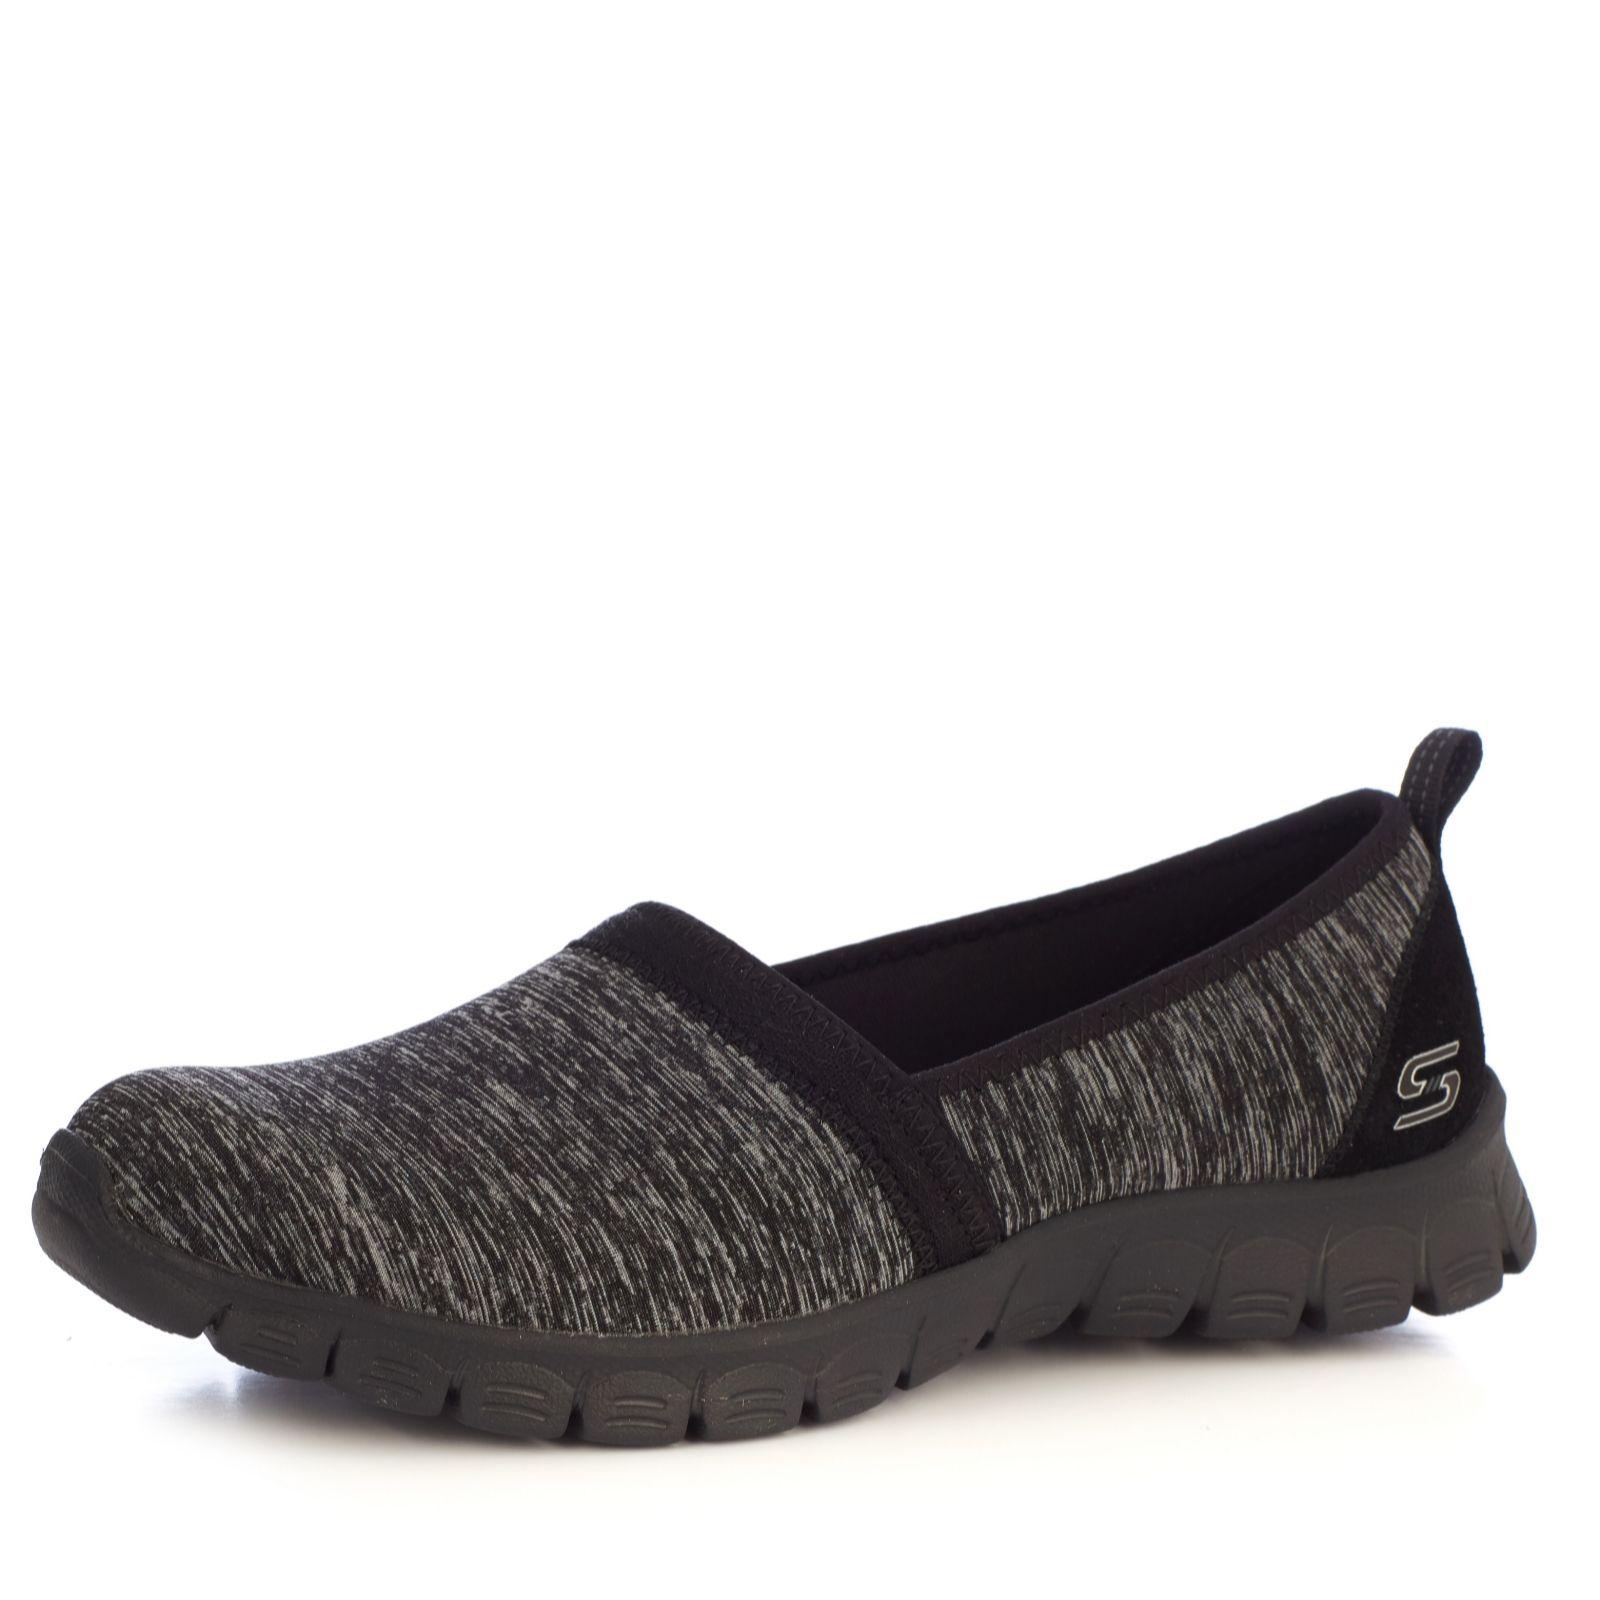 23871203016b Skechers EZ Flex Swift Motion Heathered Jersey Slip On Shoe - QVC UK